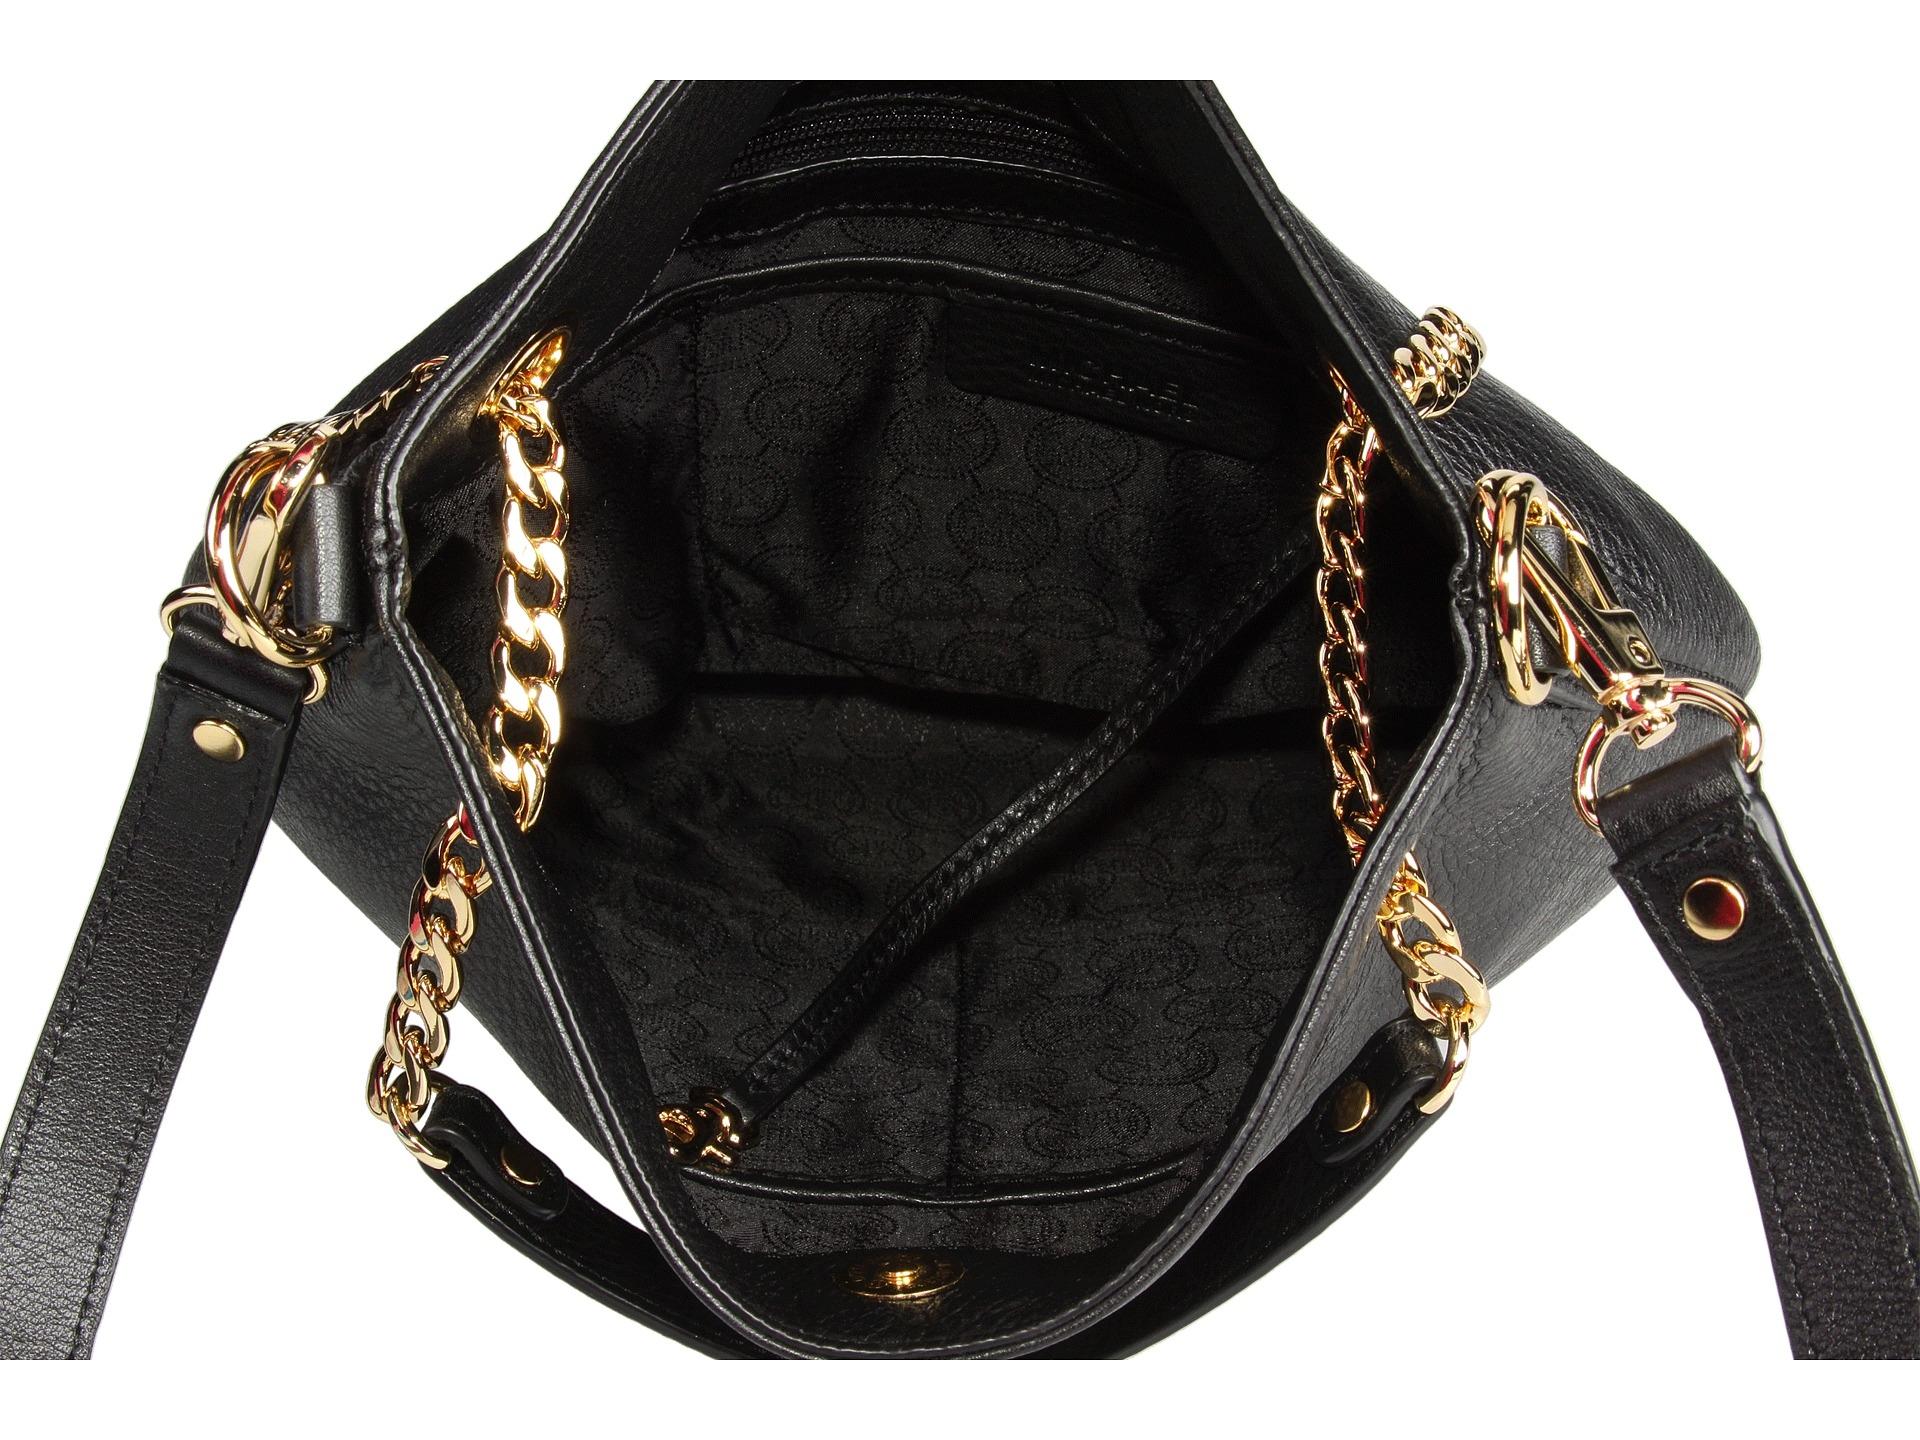 Michael Korsin Käsilaukku : Michael kors k?silaukut laukku id